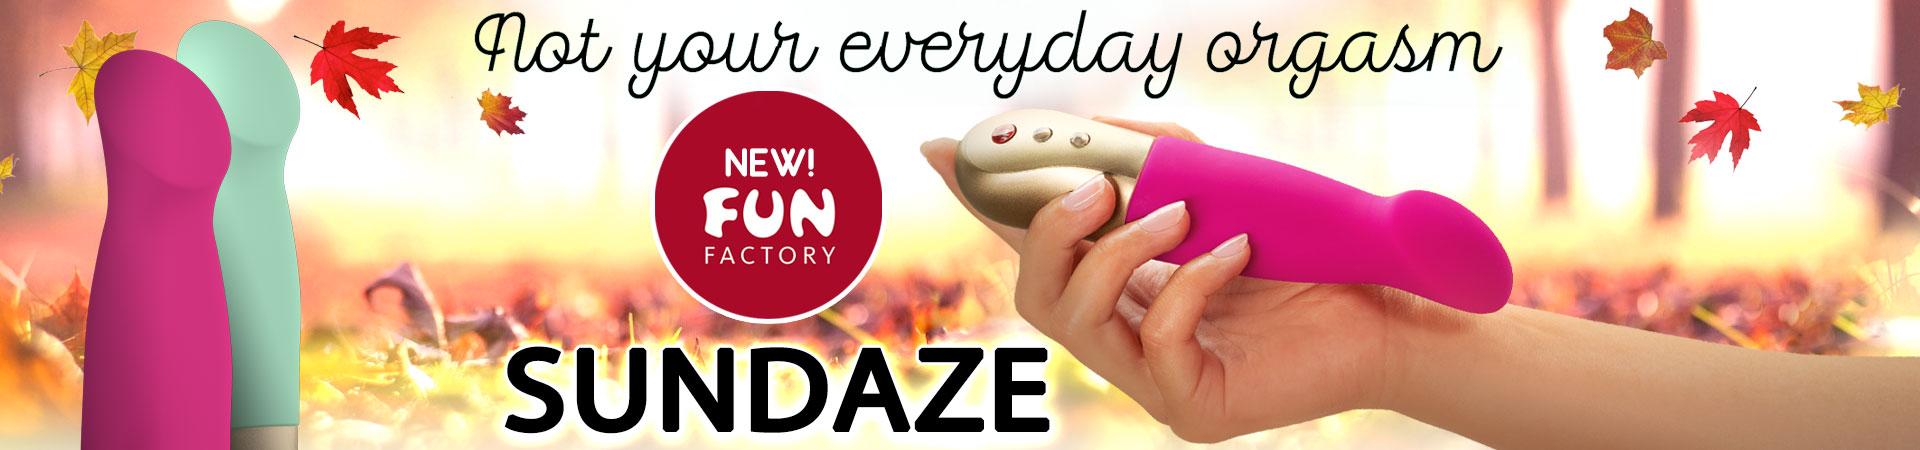 NEW! Fun Factory Sundaze!